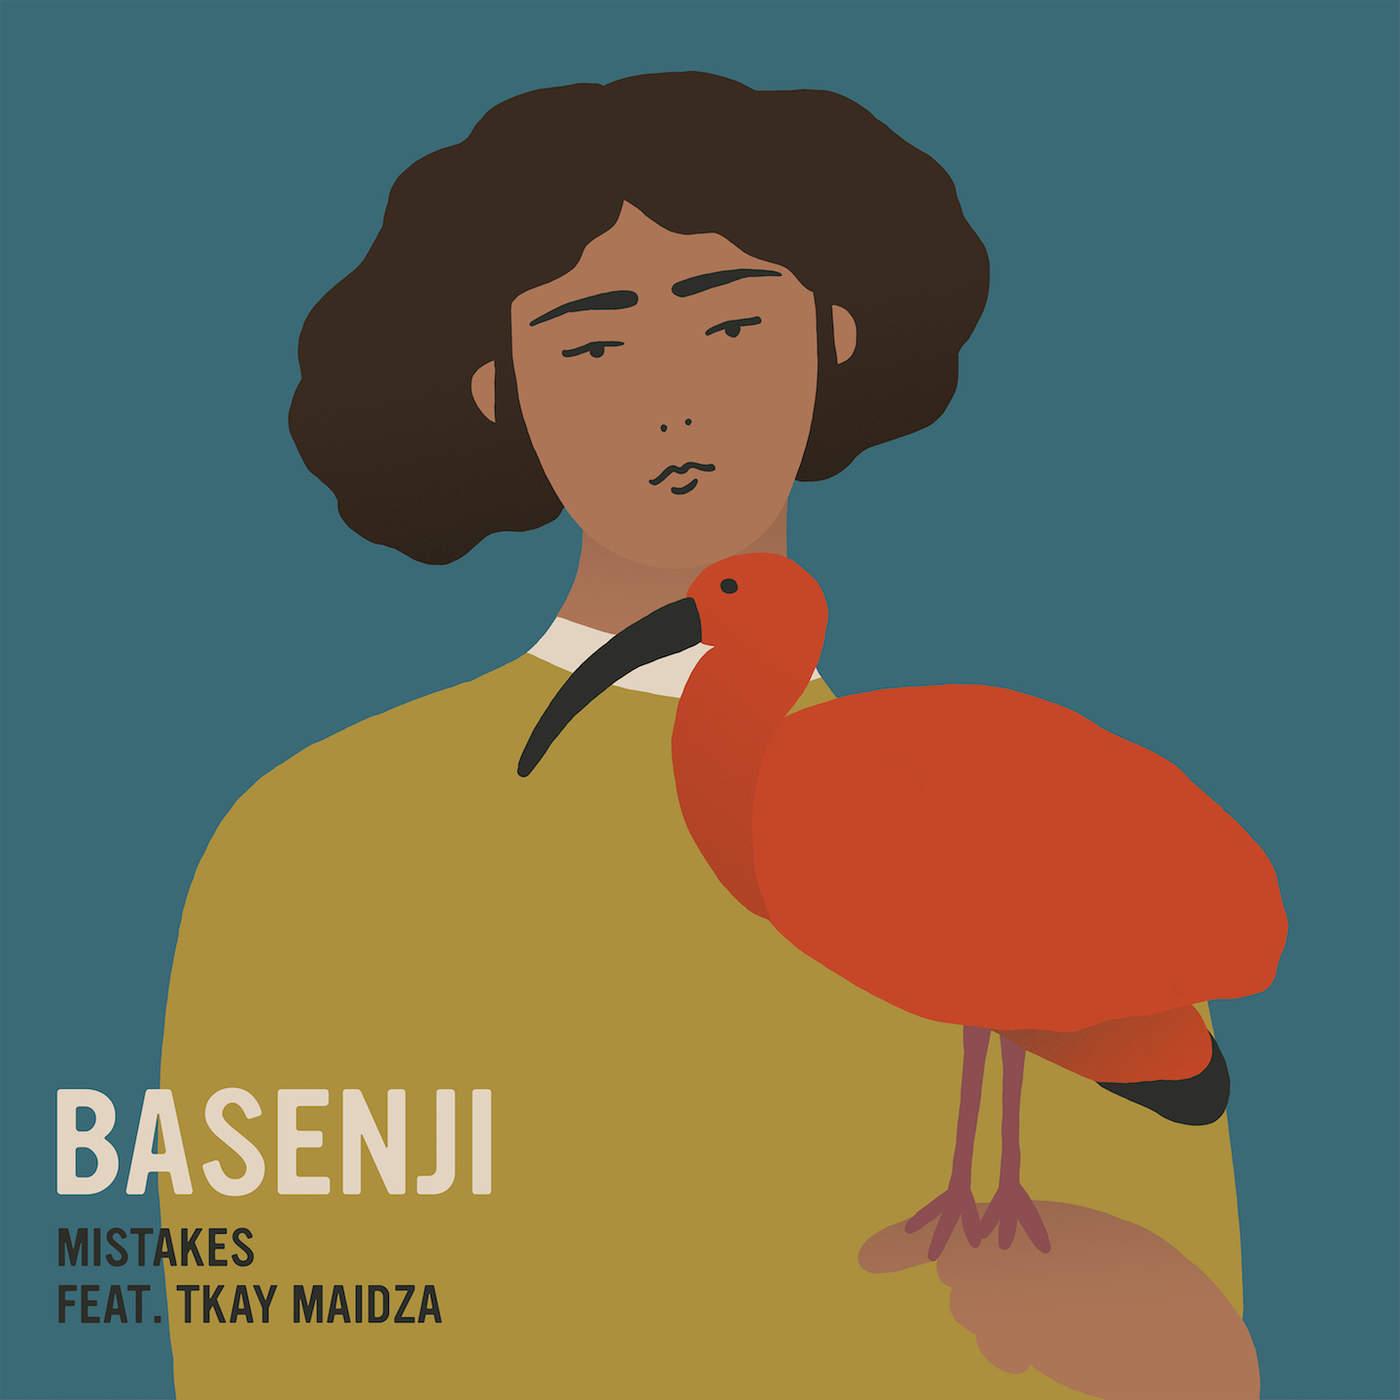 Basenji - Mistakes (feat. Tkay Maidza) - Single